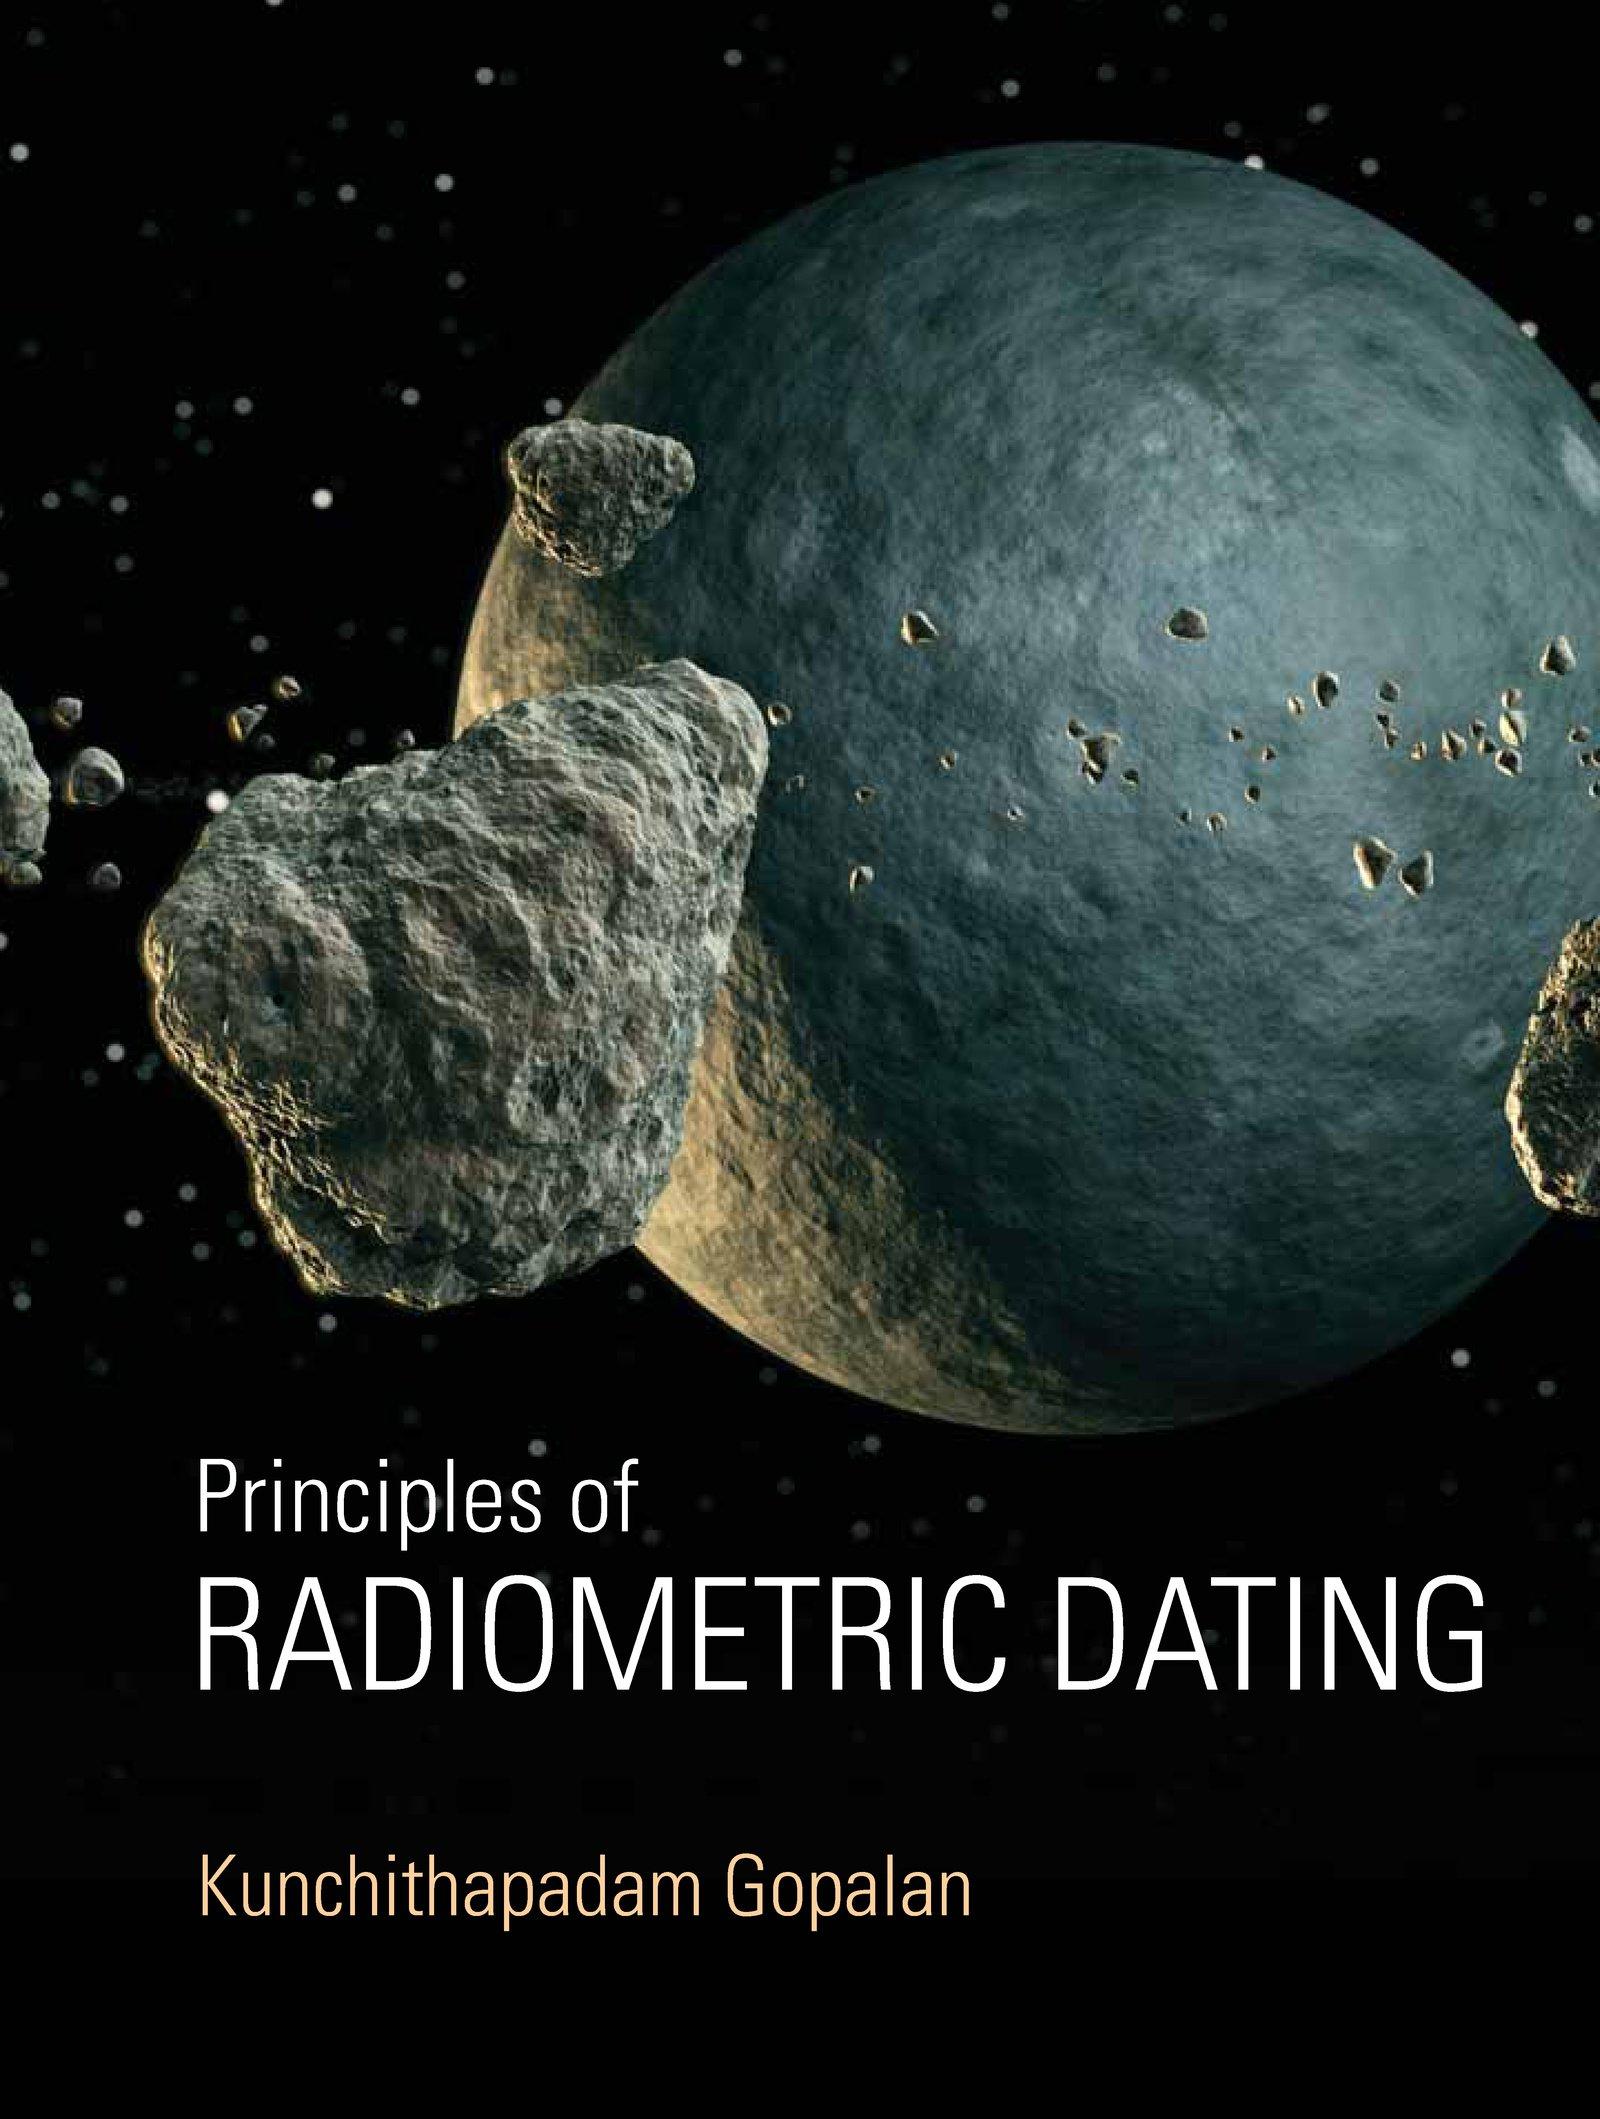 Of rocks moon dating radiometric Creation 101: